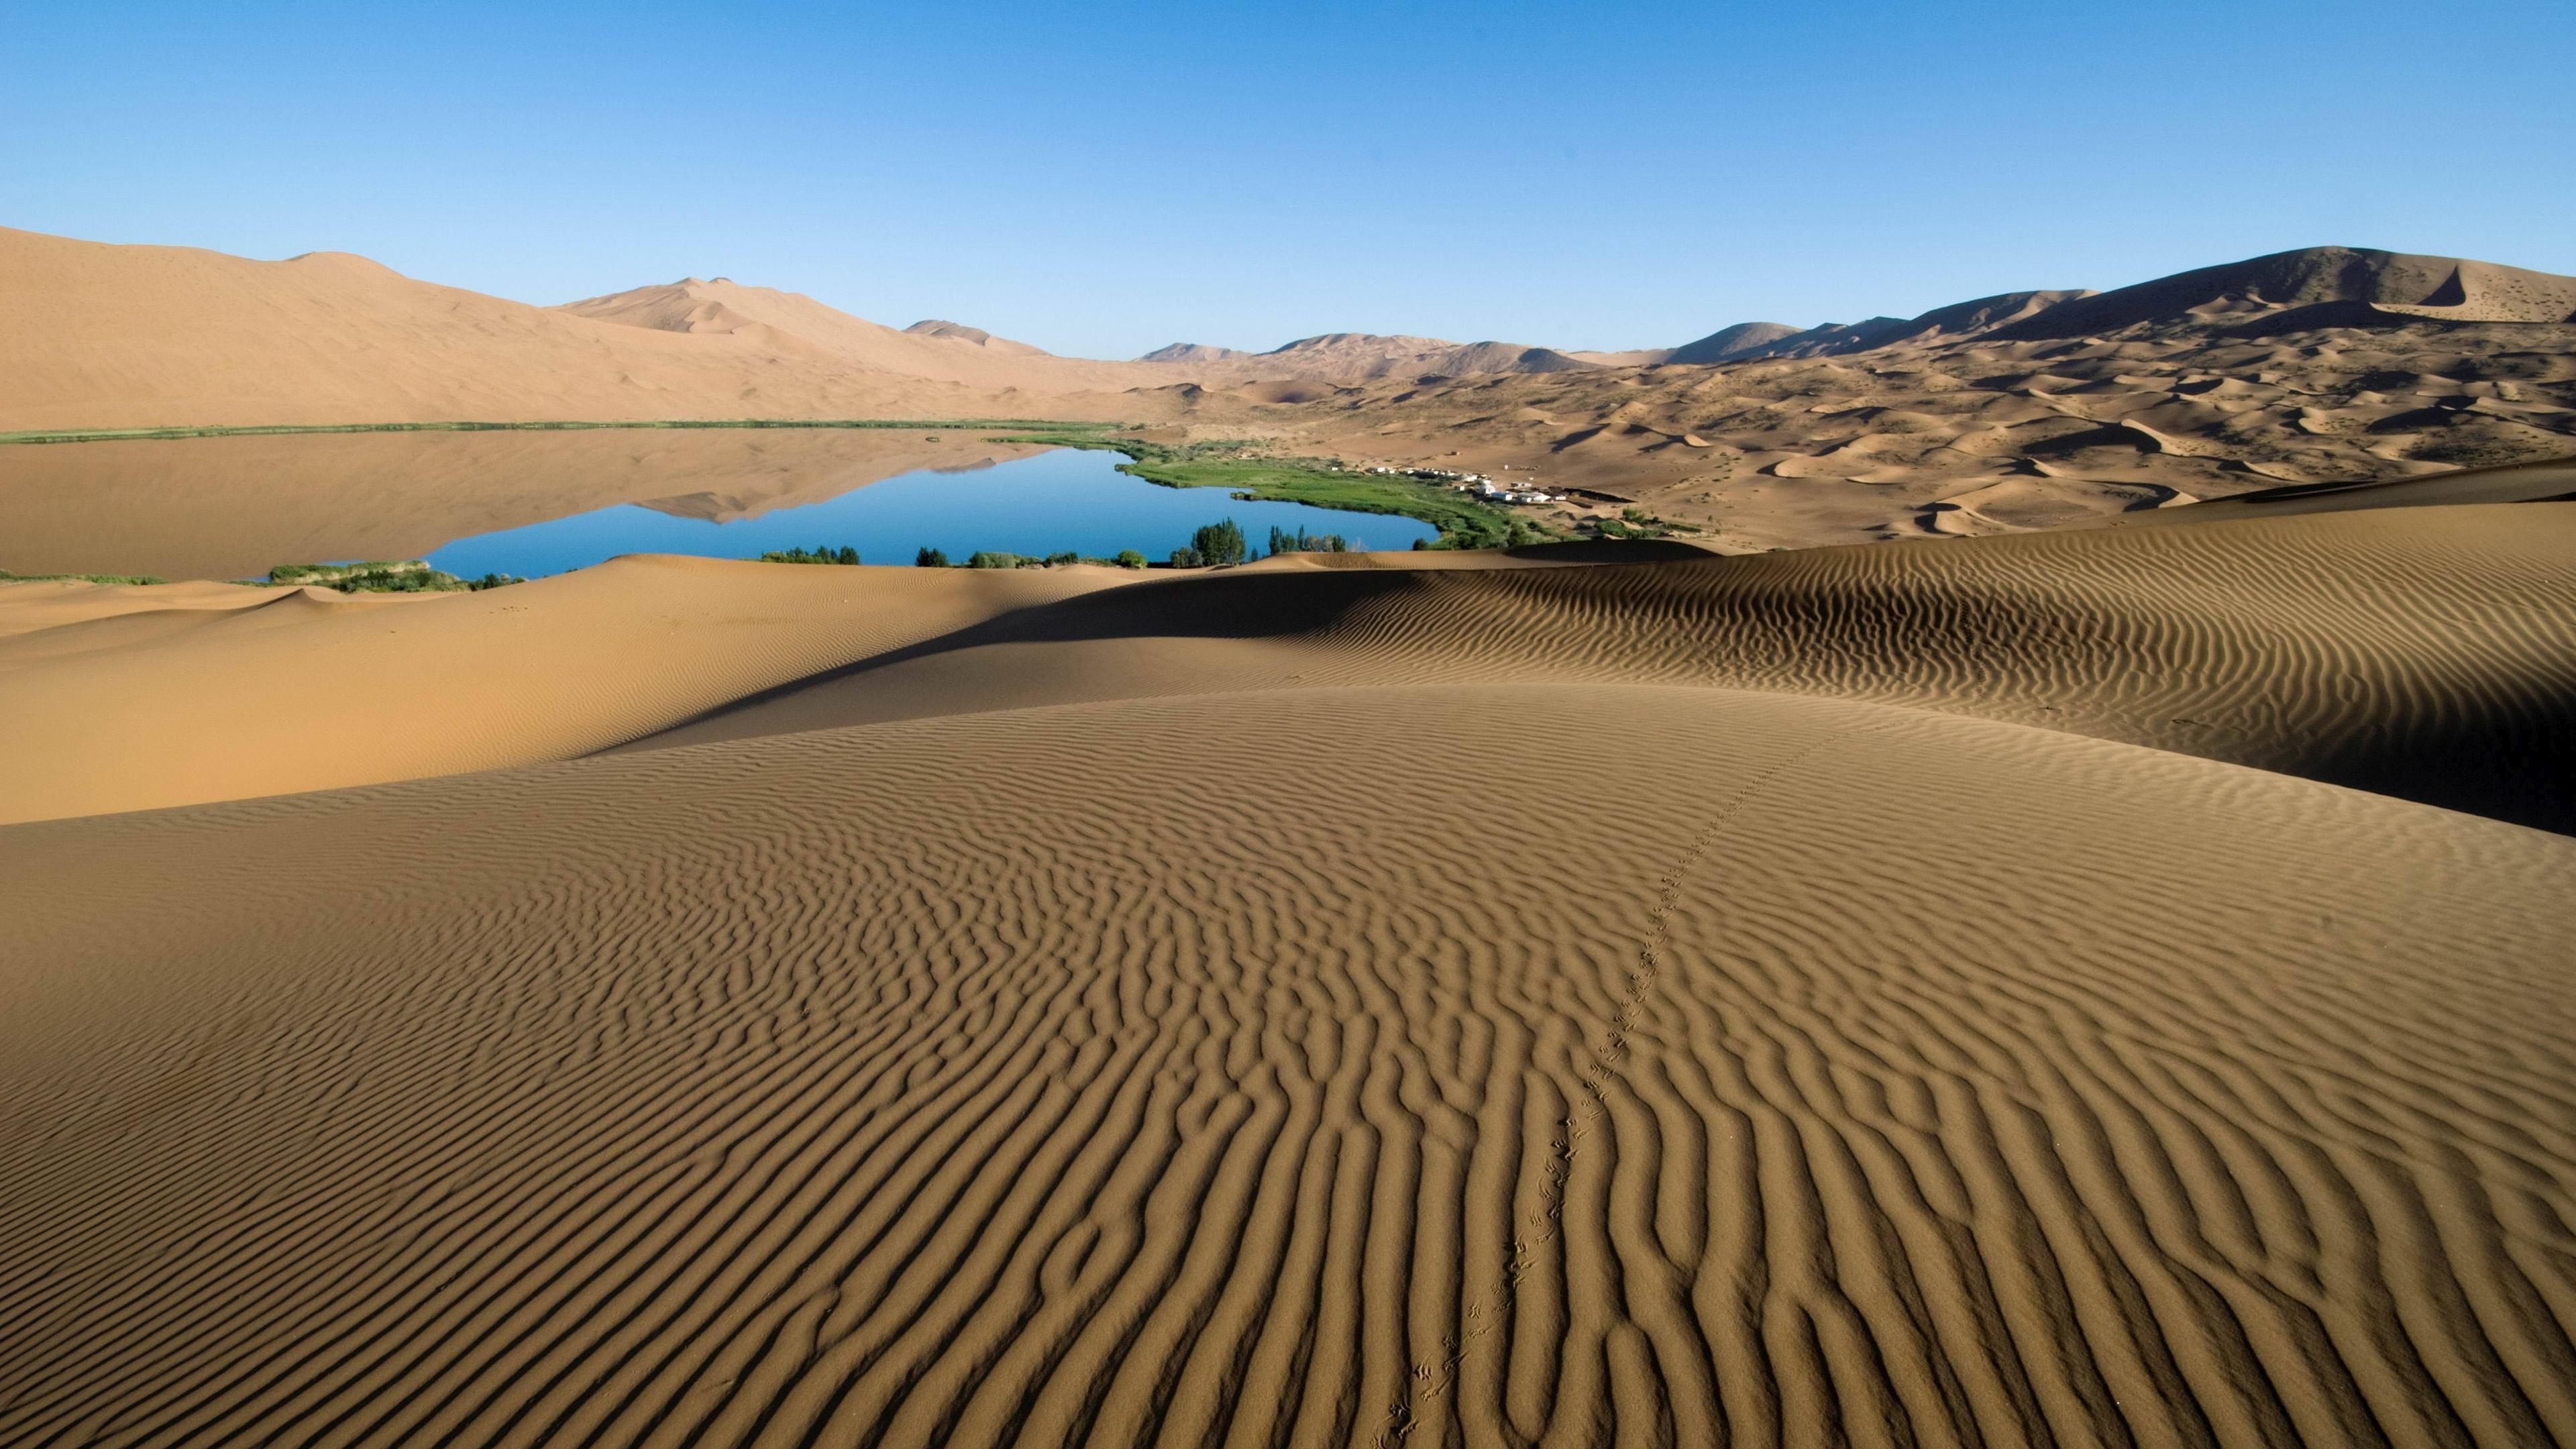 oasis-in-the-desert-9153-3840x2160